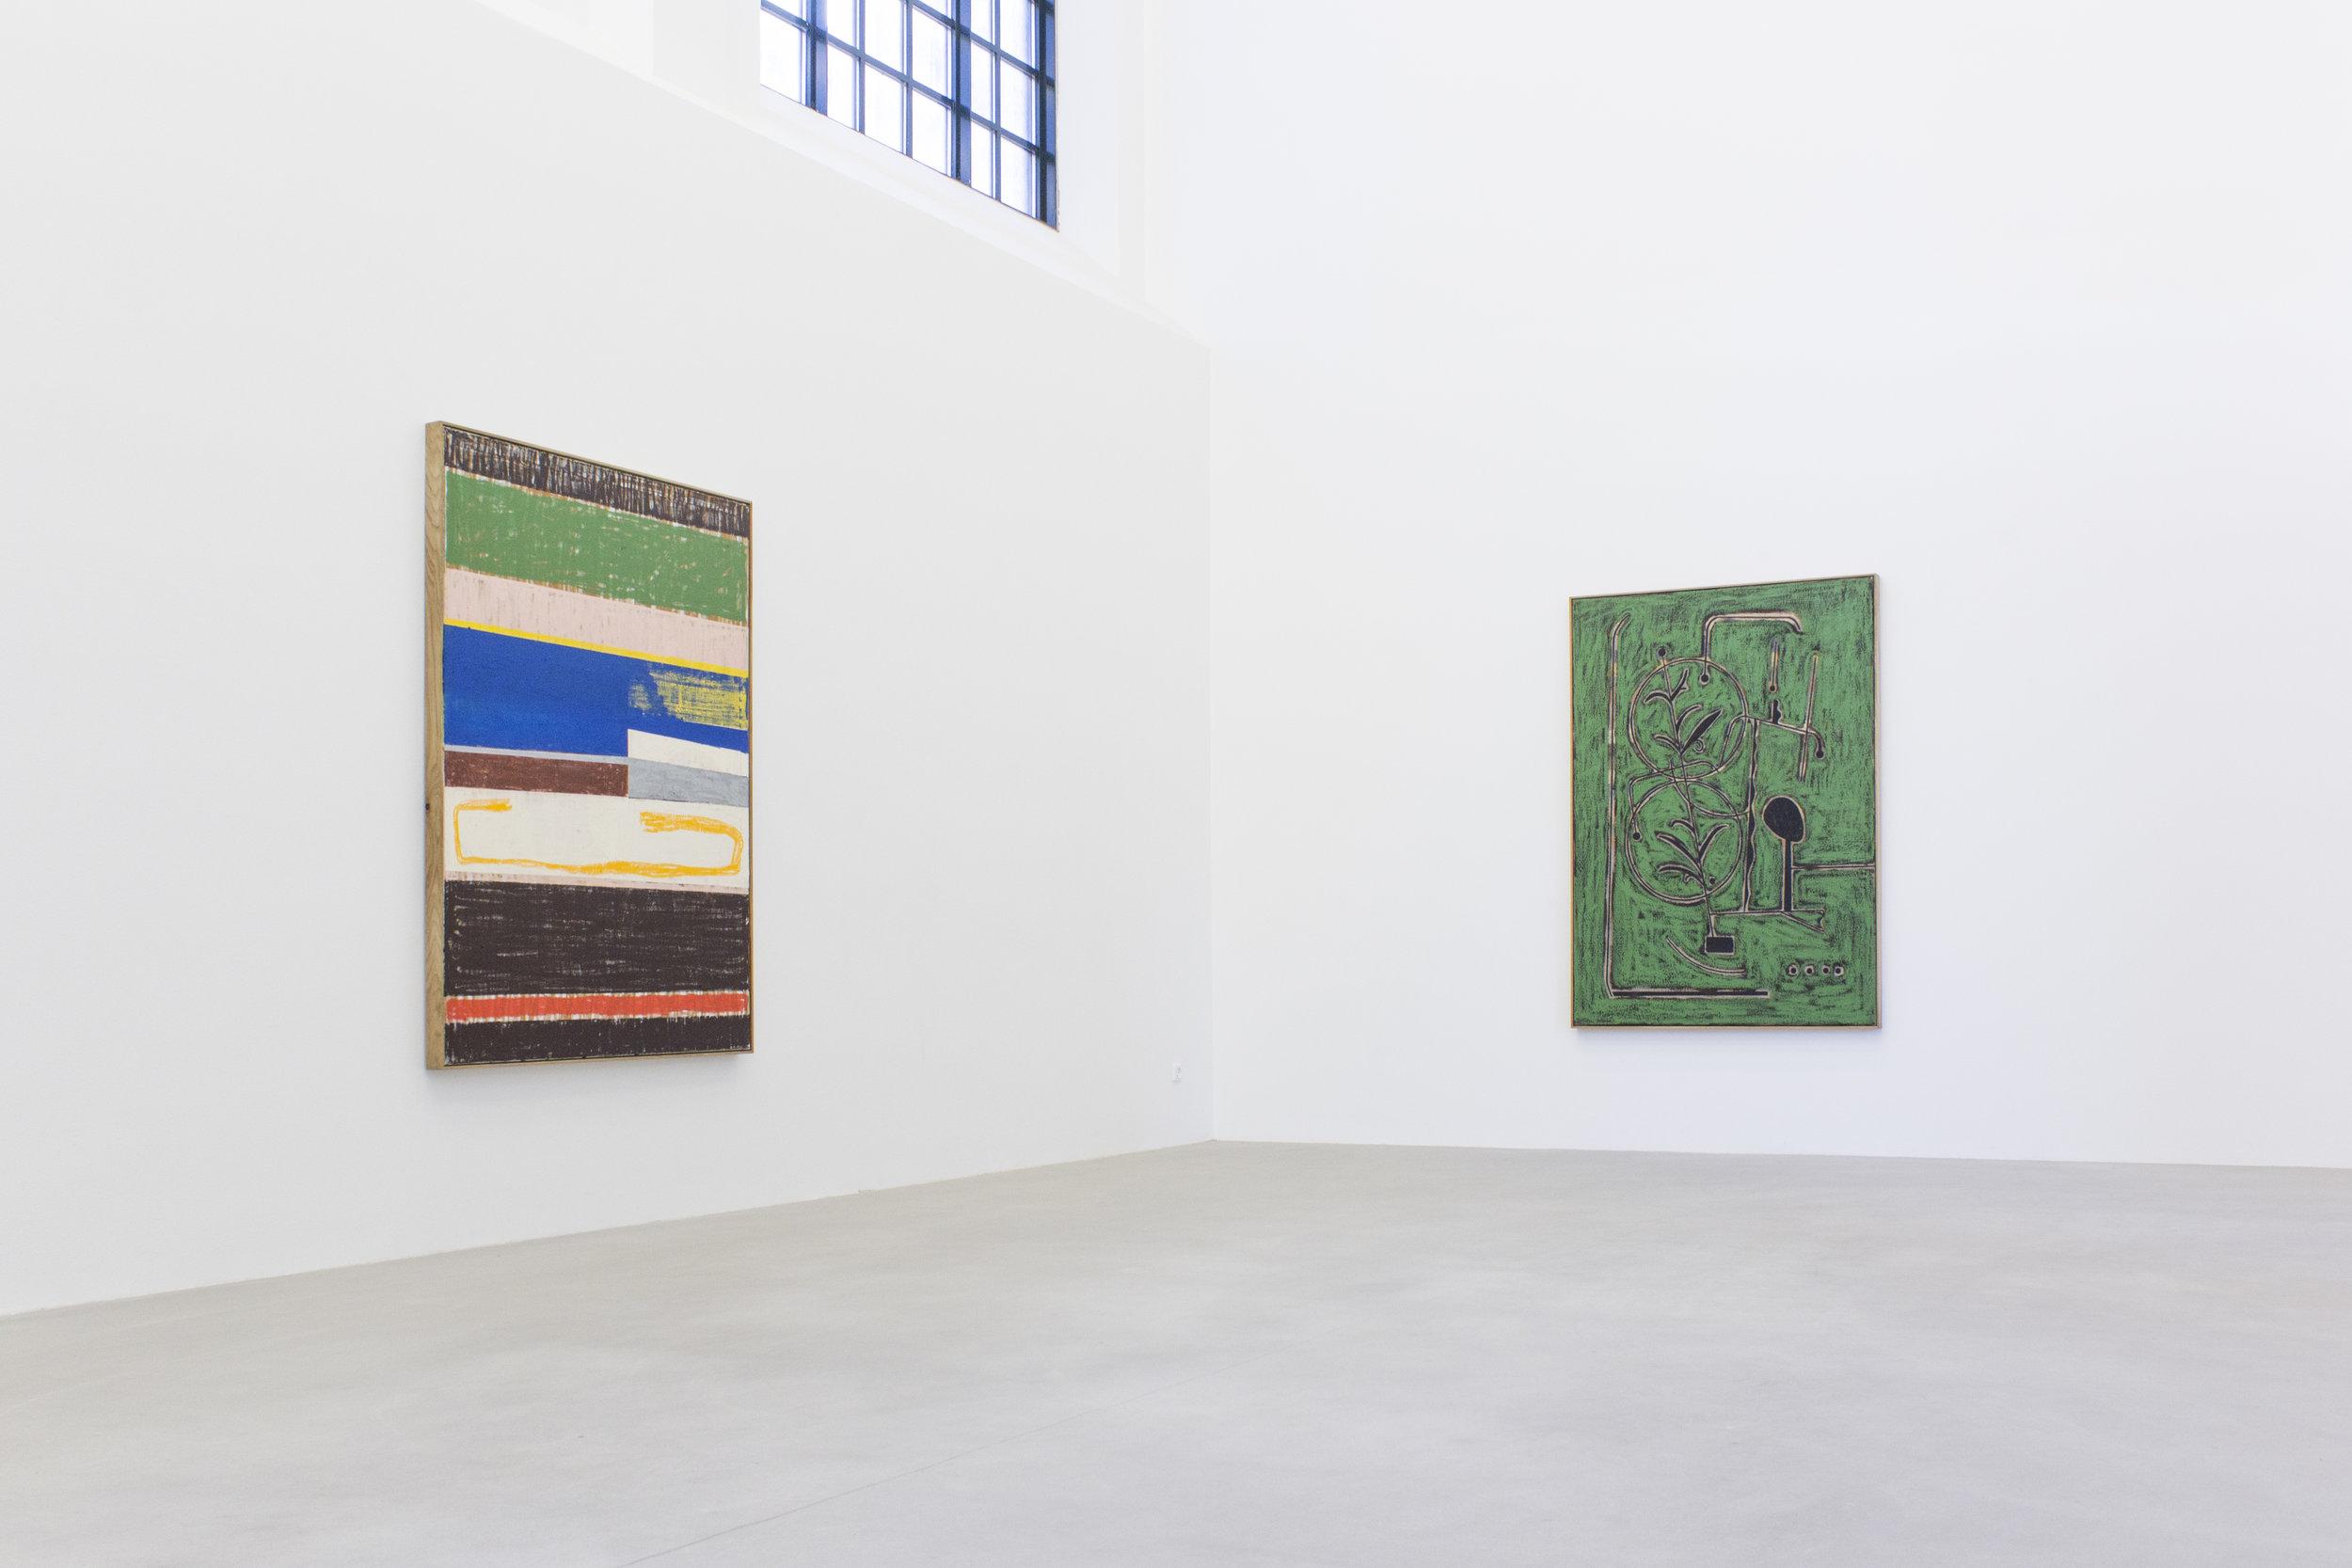 How does a strawberry taste, Gallery Jacob Bjørn, 2017